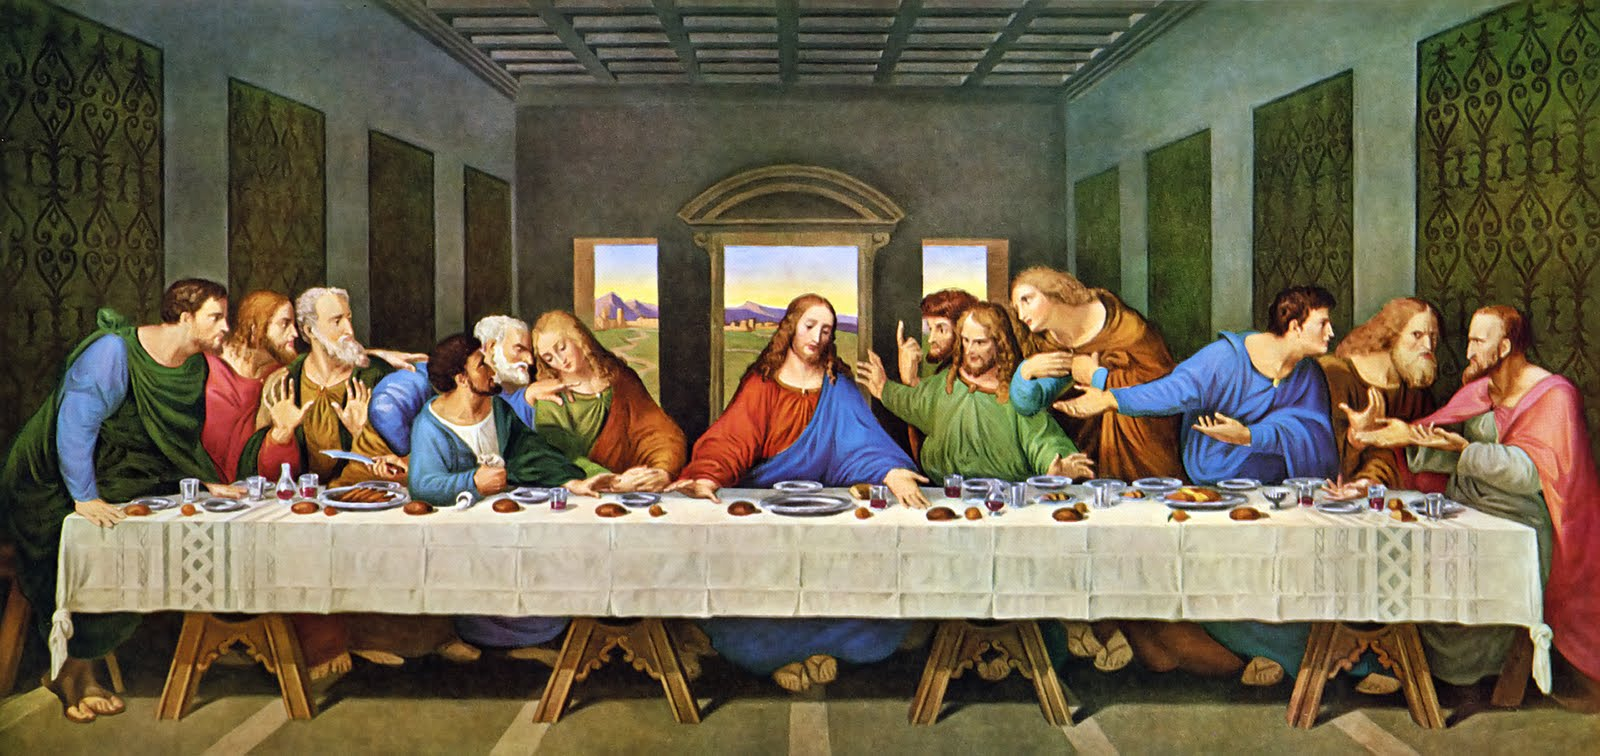 Passover 2013 image - Christians of Moddb - Mod DB Da Vinci Last Supper Restored